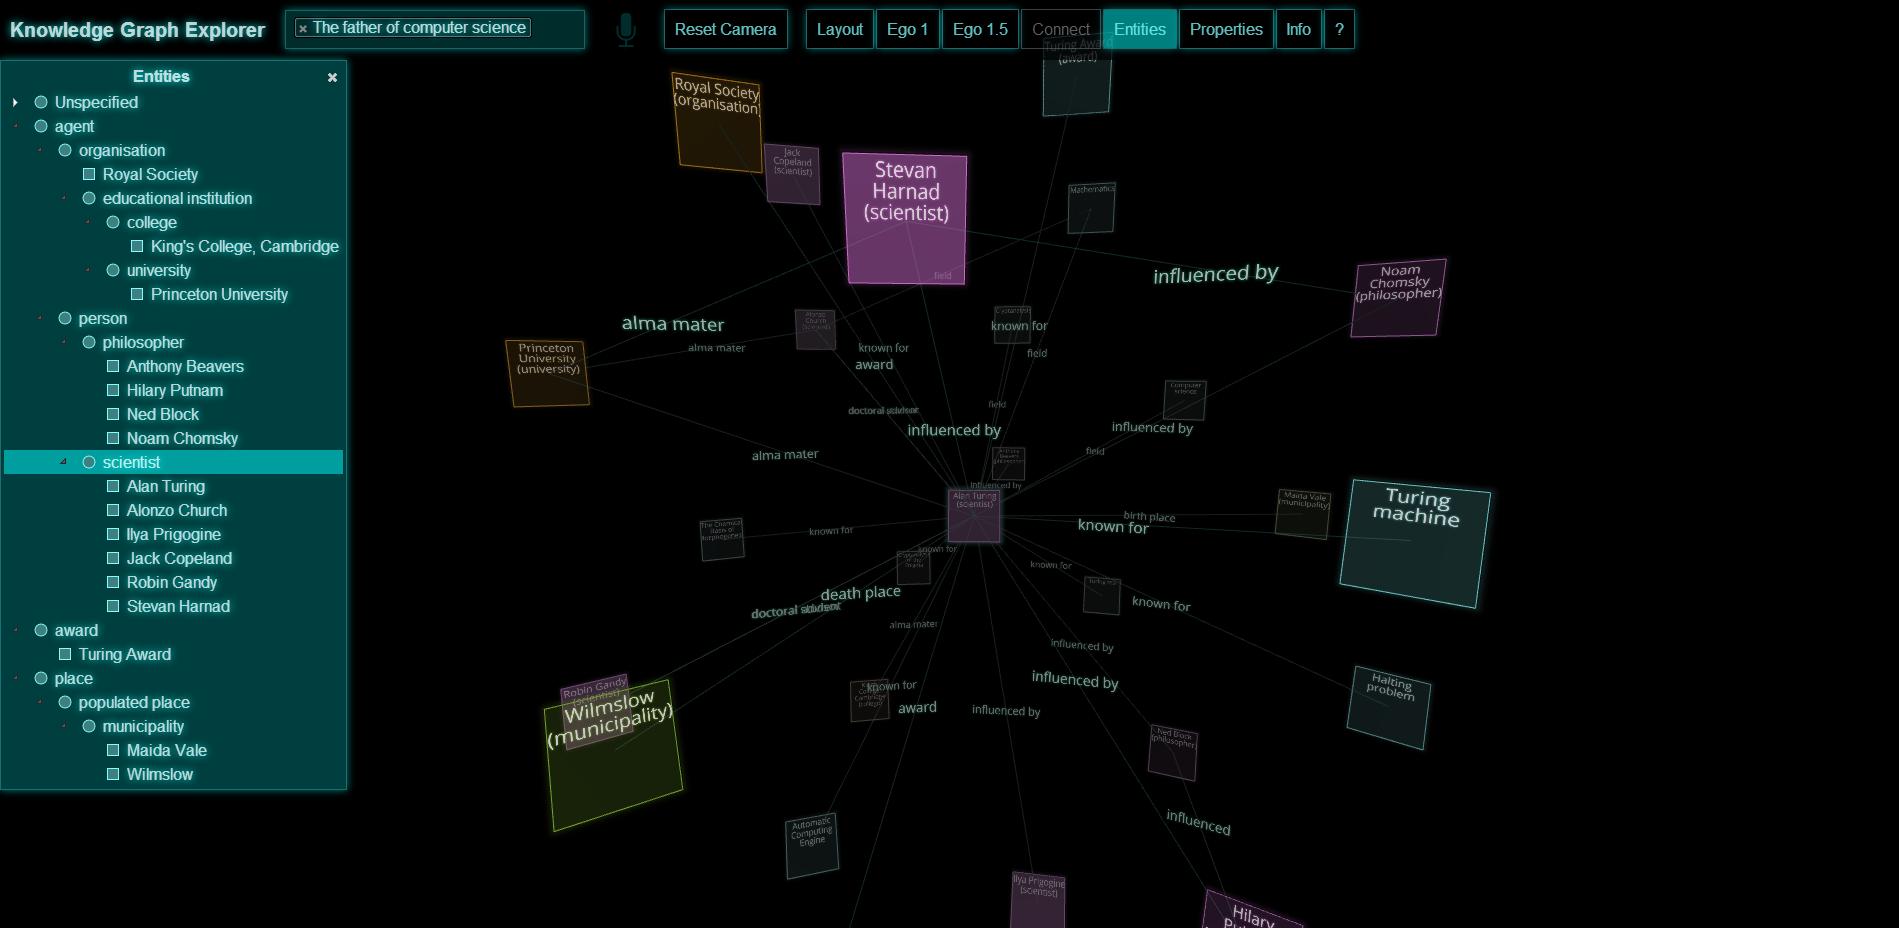 Jamie Rasmussen : Knowledge Graph Explorer